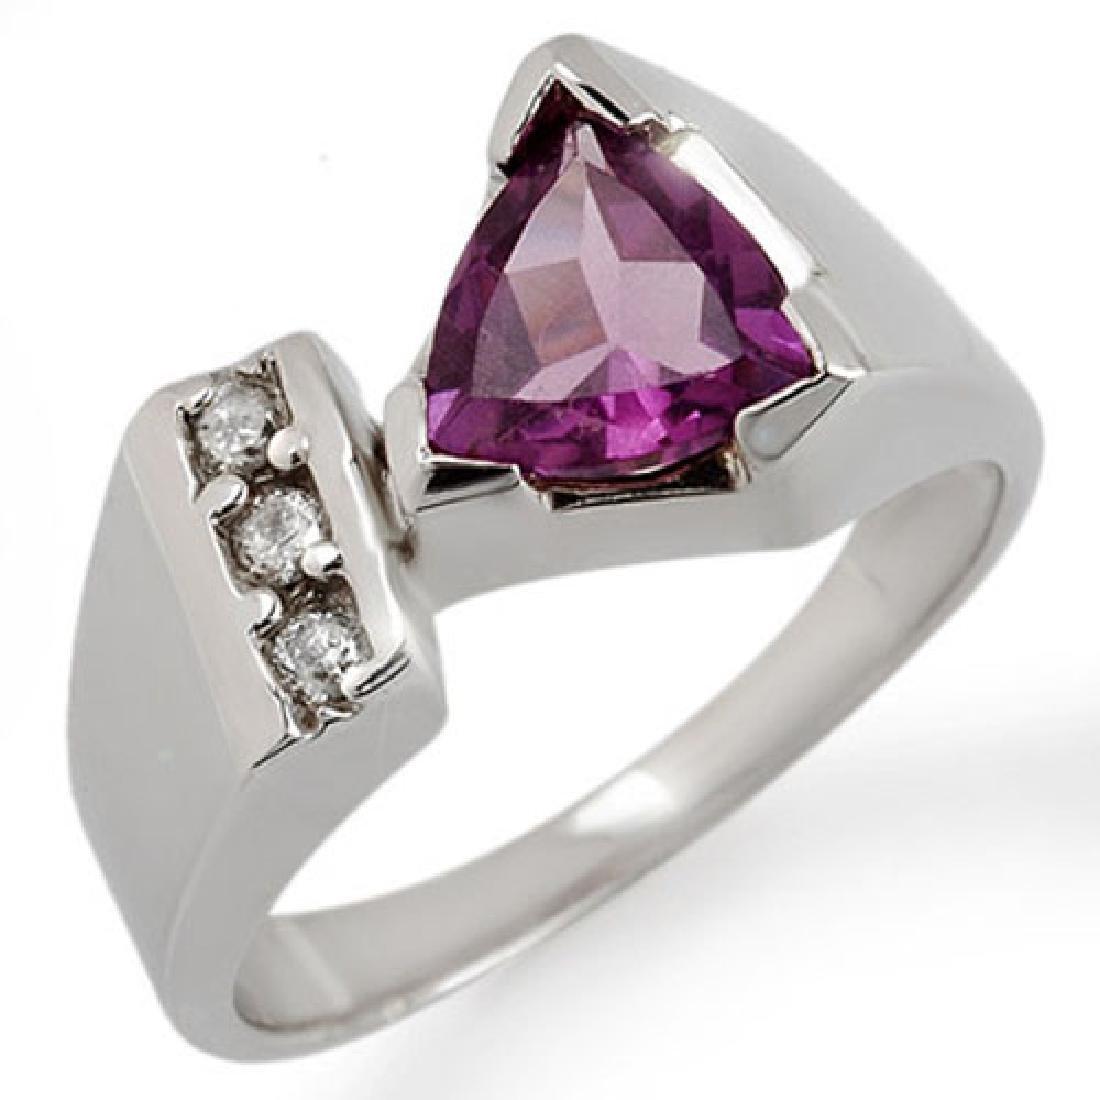 1.0 CTW Amethyst & Diamond Ring 10K White Gold